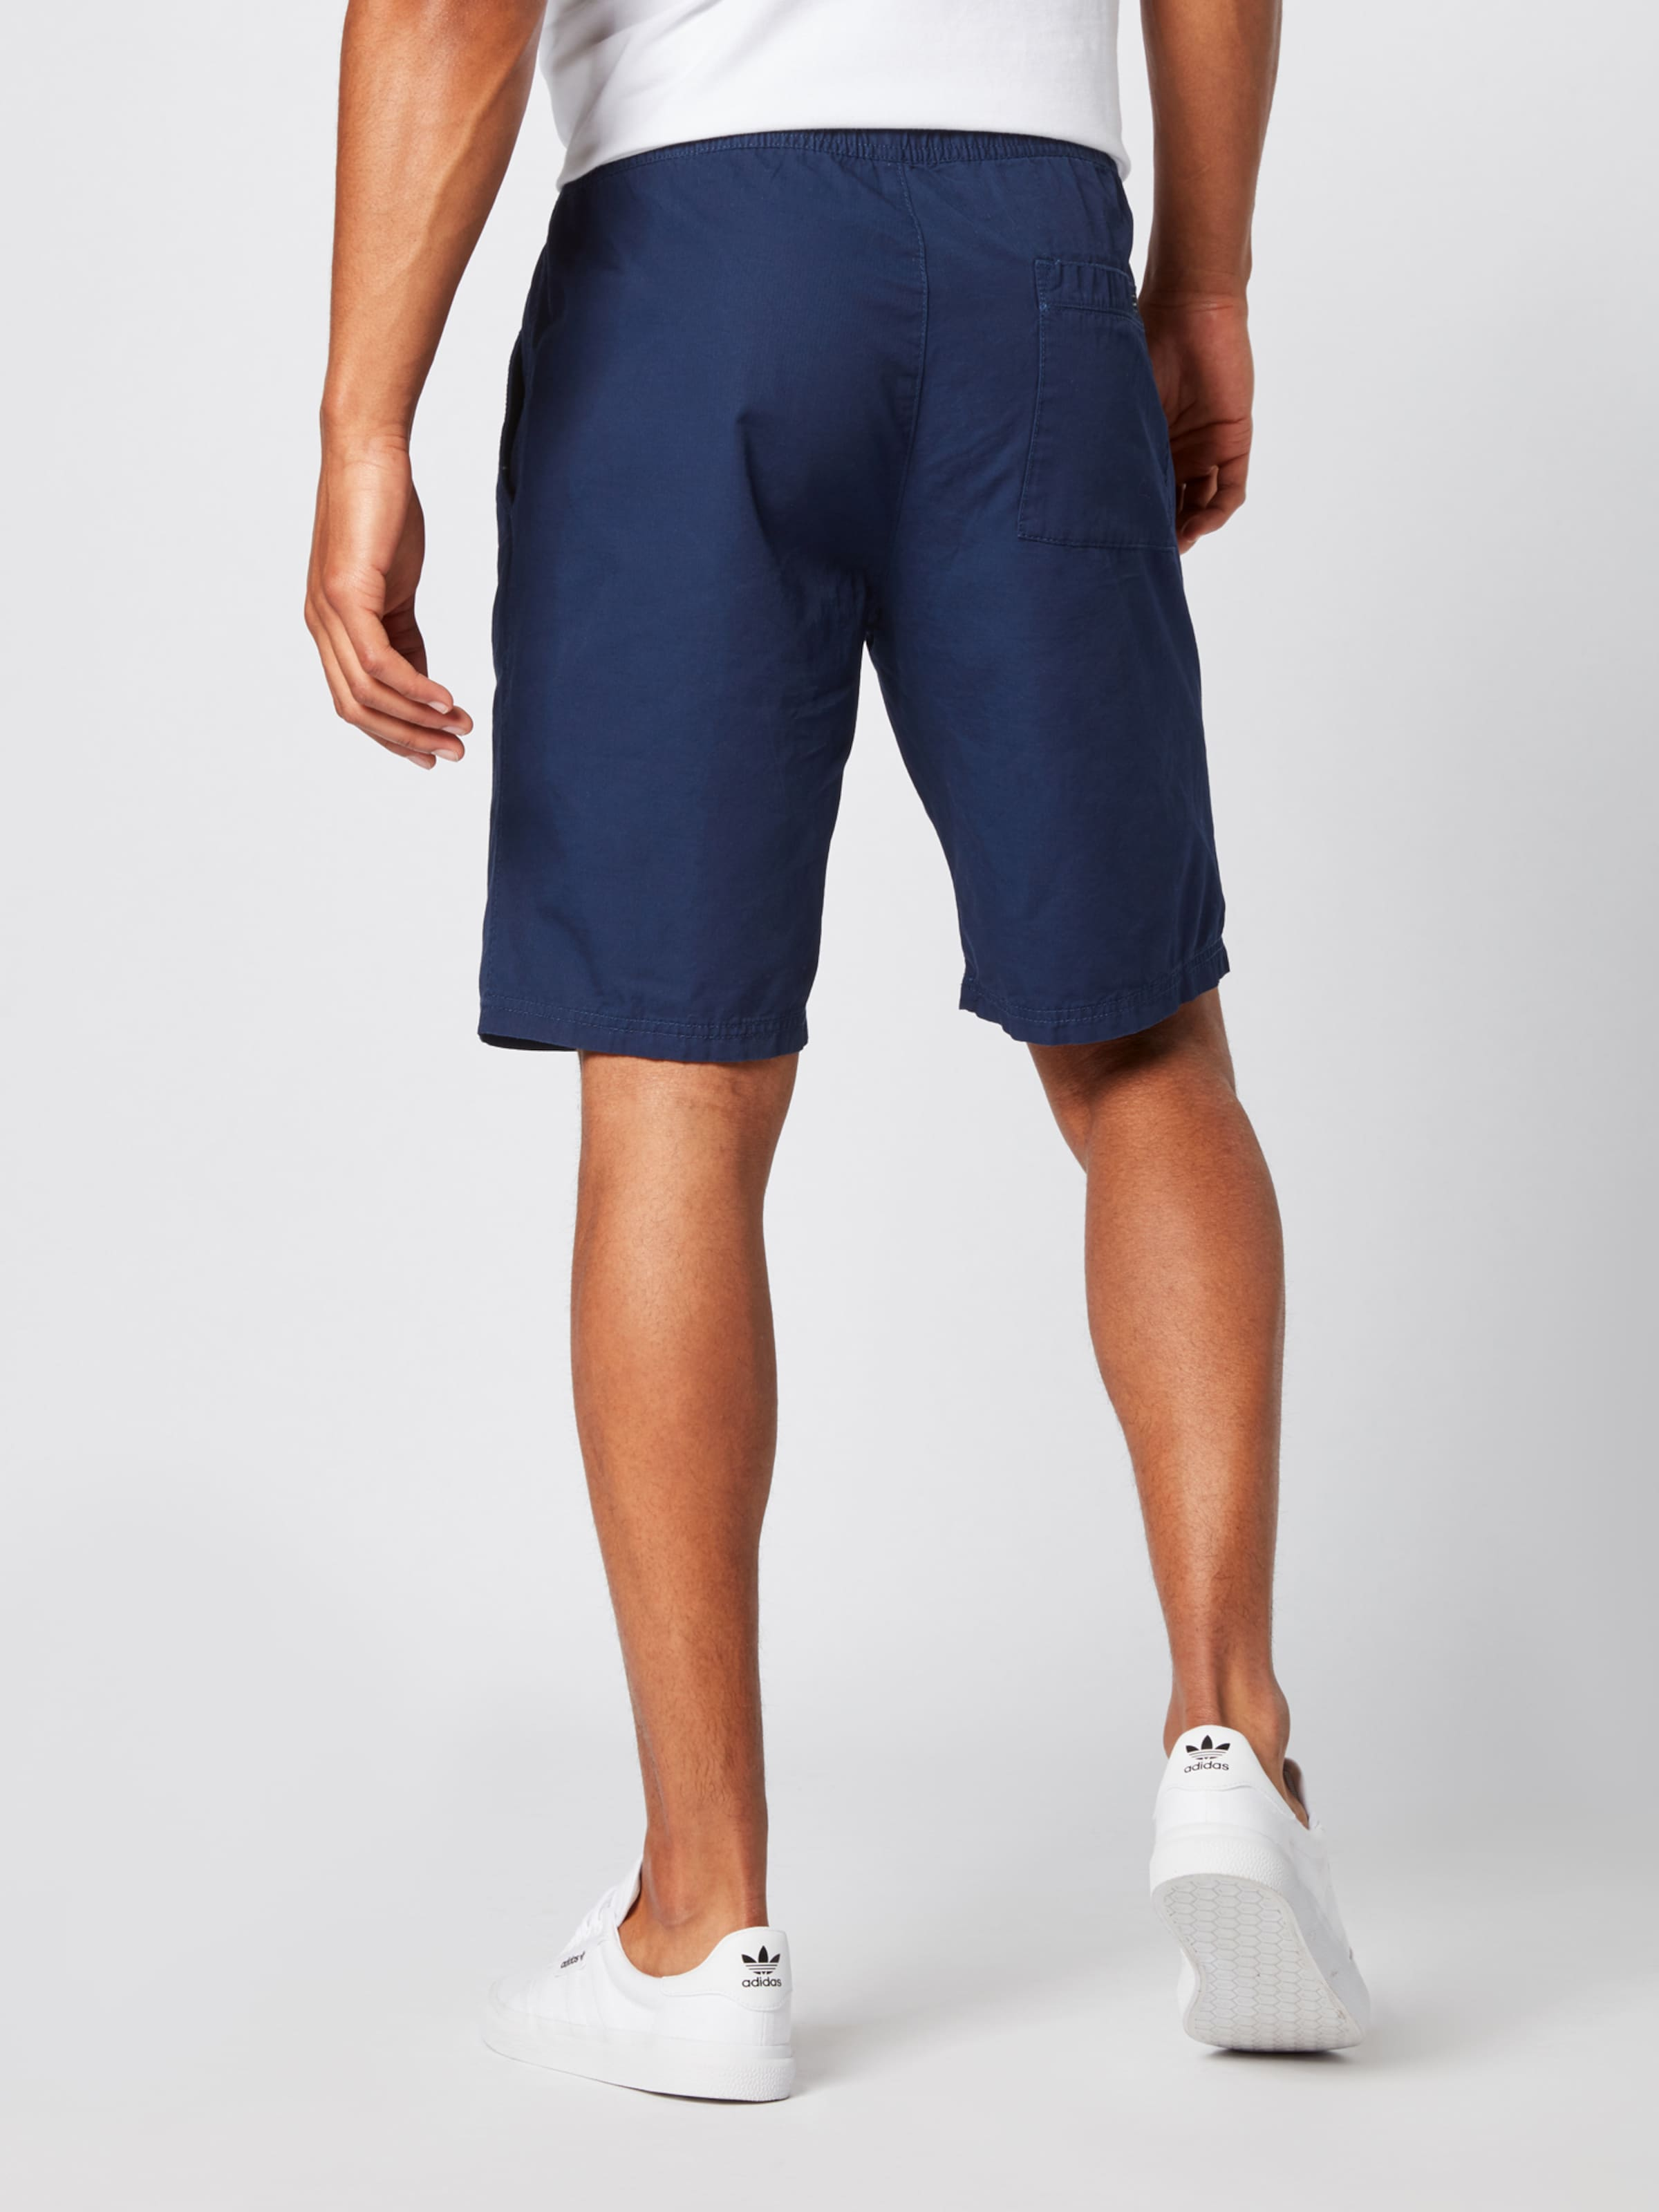 Bleu Red En Pastel oliver S Pantalon Label kZ8nOX0wNP